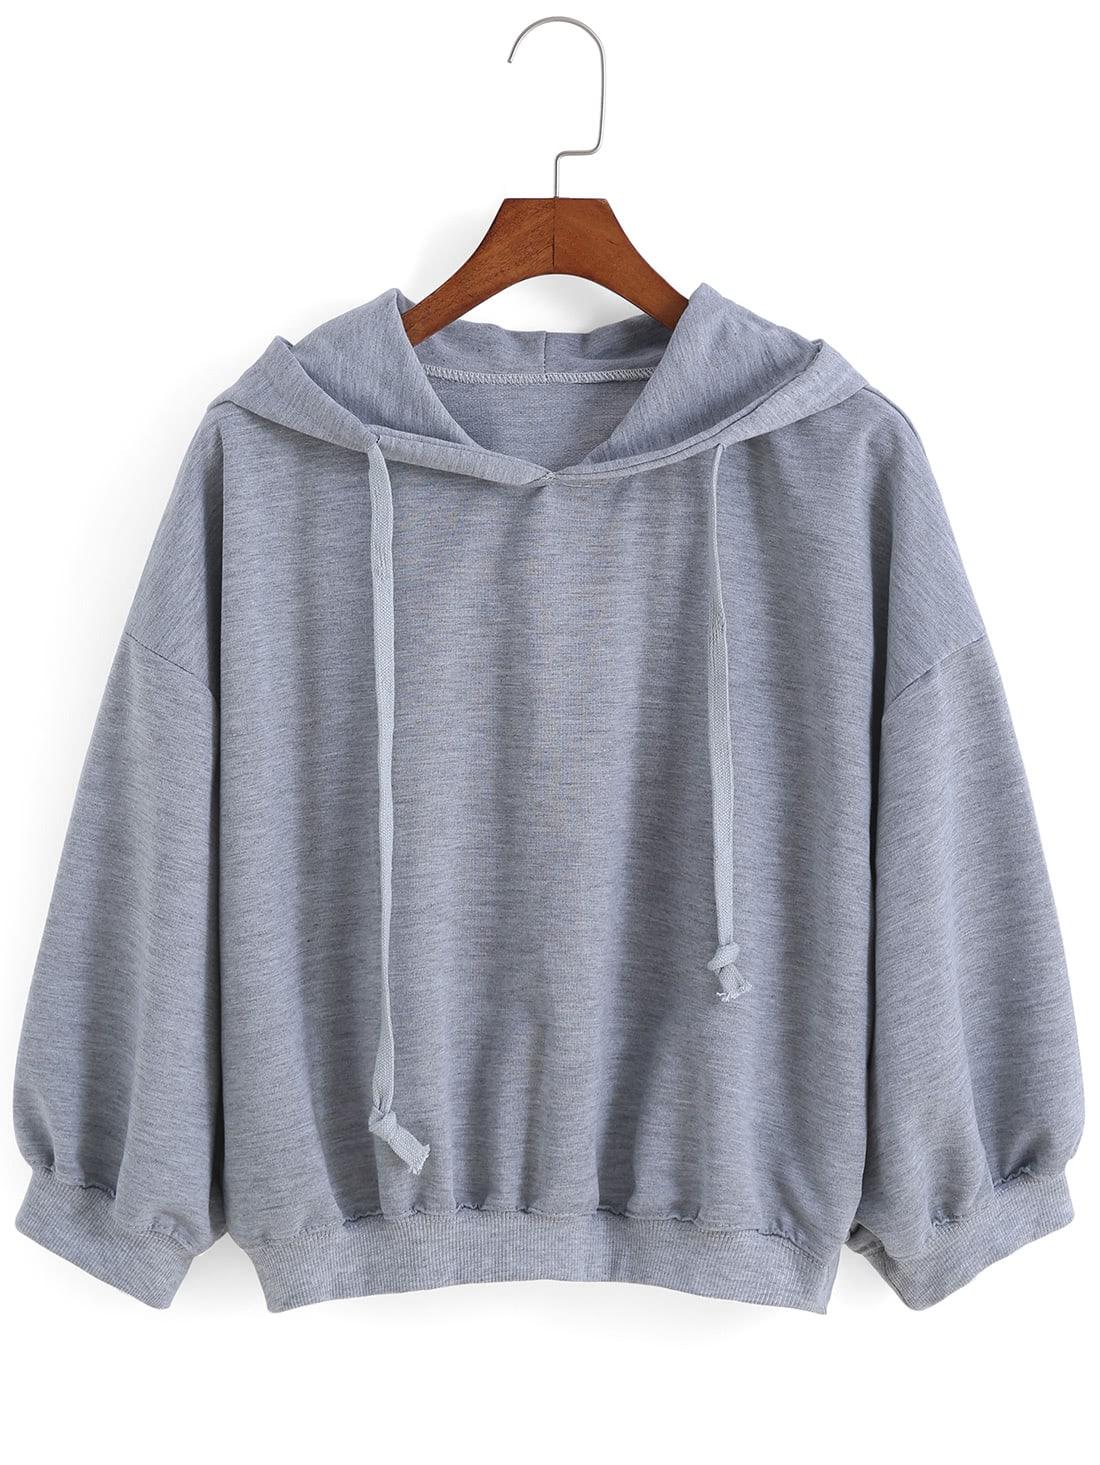 Hooded Drawstring Loose Grey Sweatshirt